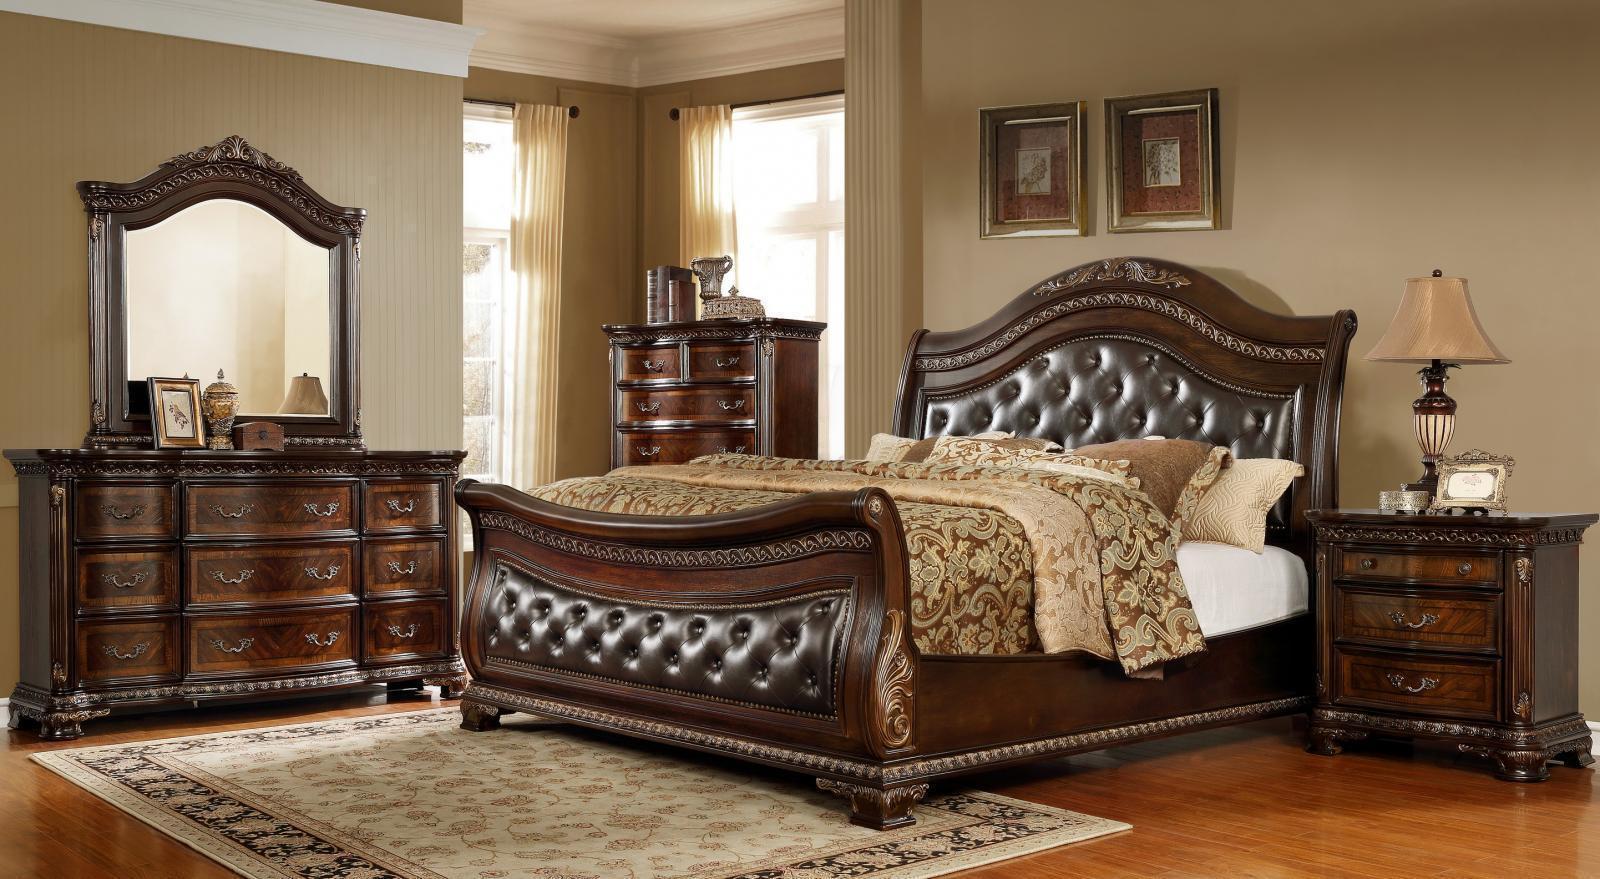 McFerran B9588 Cherry Leather Headboard Sleigh King Size Bedroom Set 5Pcs